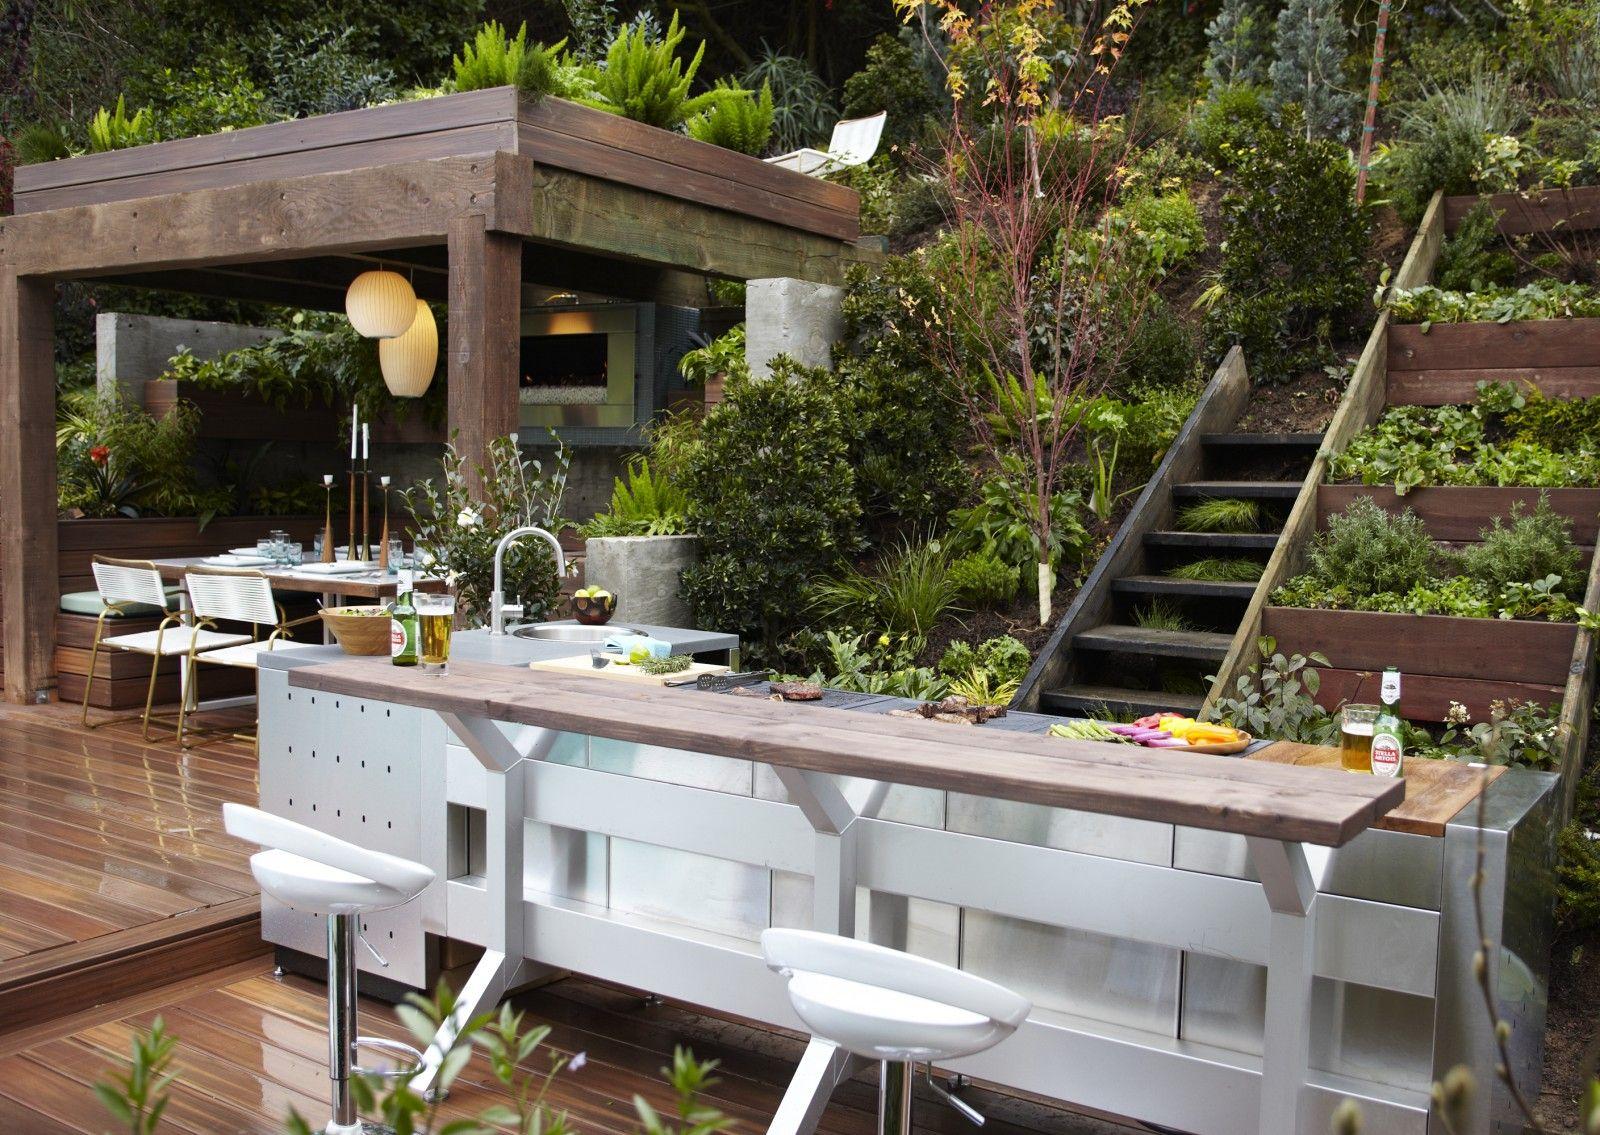 Küchendesign im freien amazing tropical style outdoor kitchen design repined by